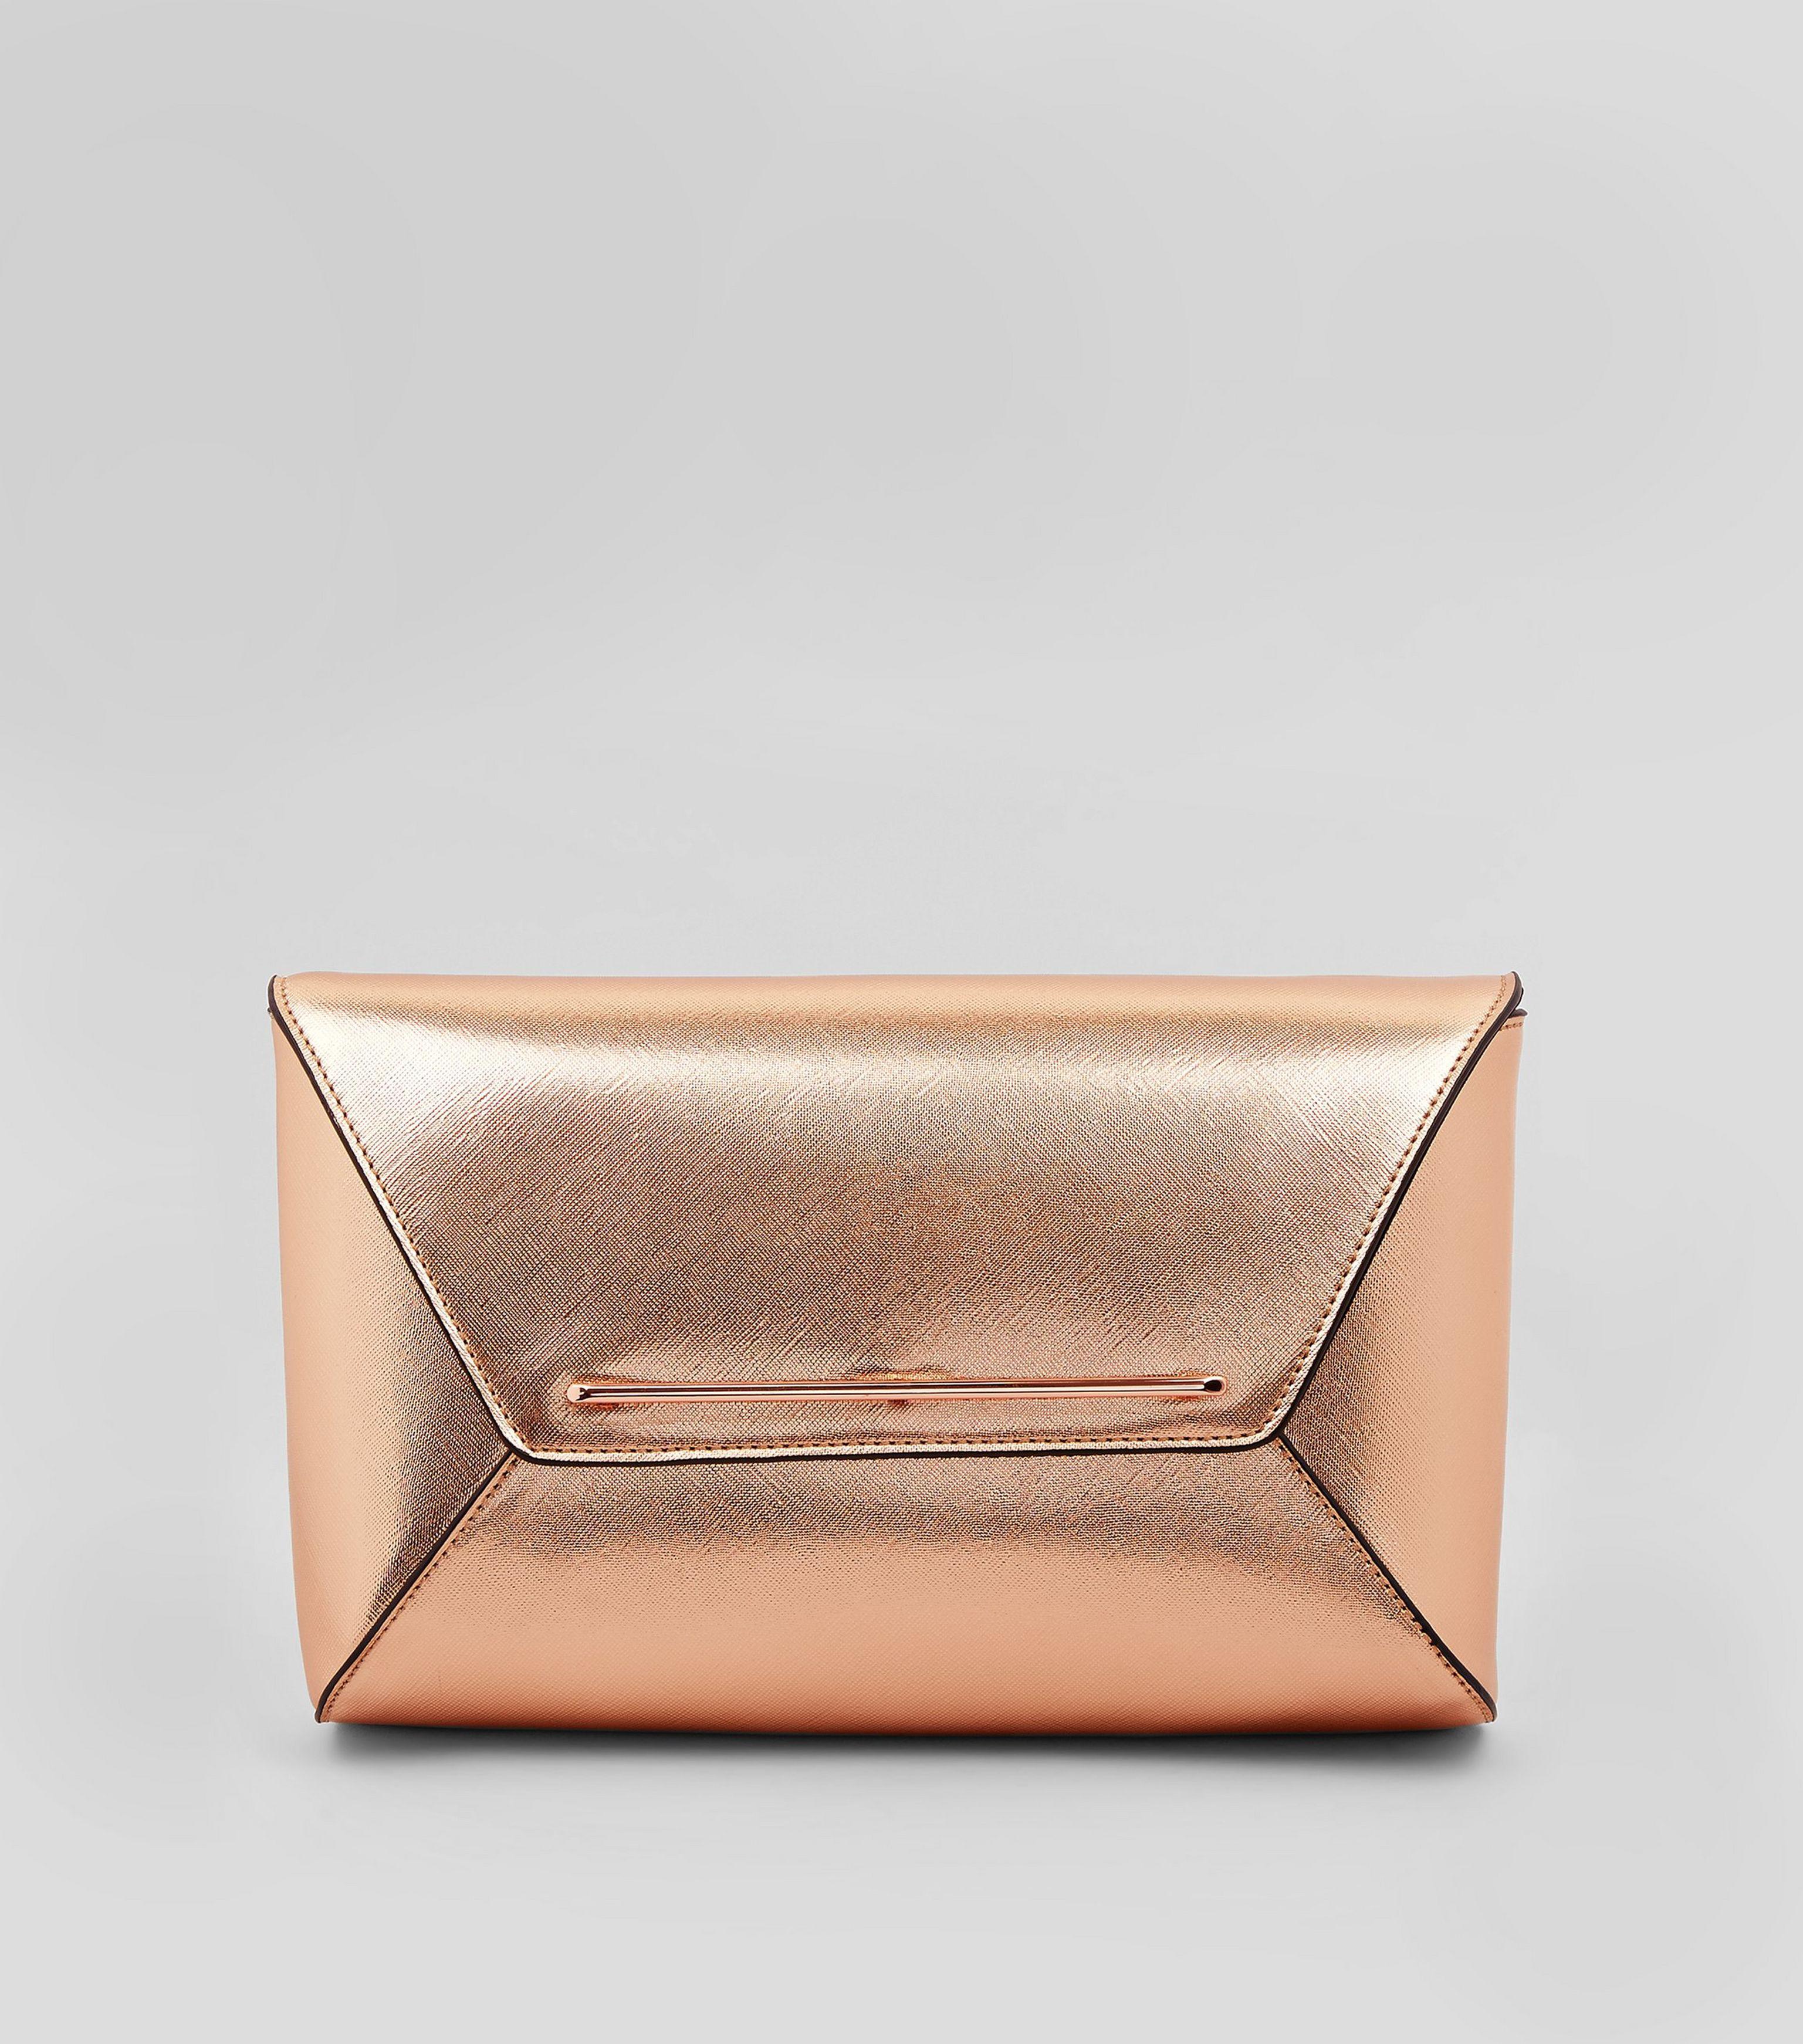 greatvarieties choose original colours and striking Women's Rose Gold Metallic Envelope Clutch Bag